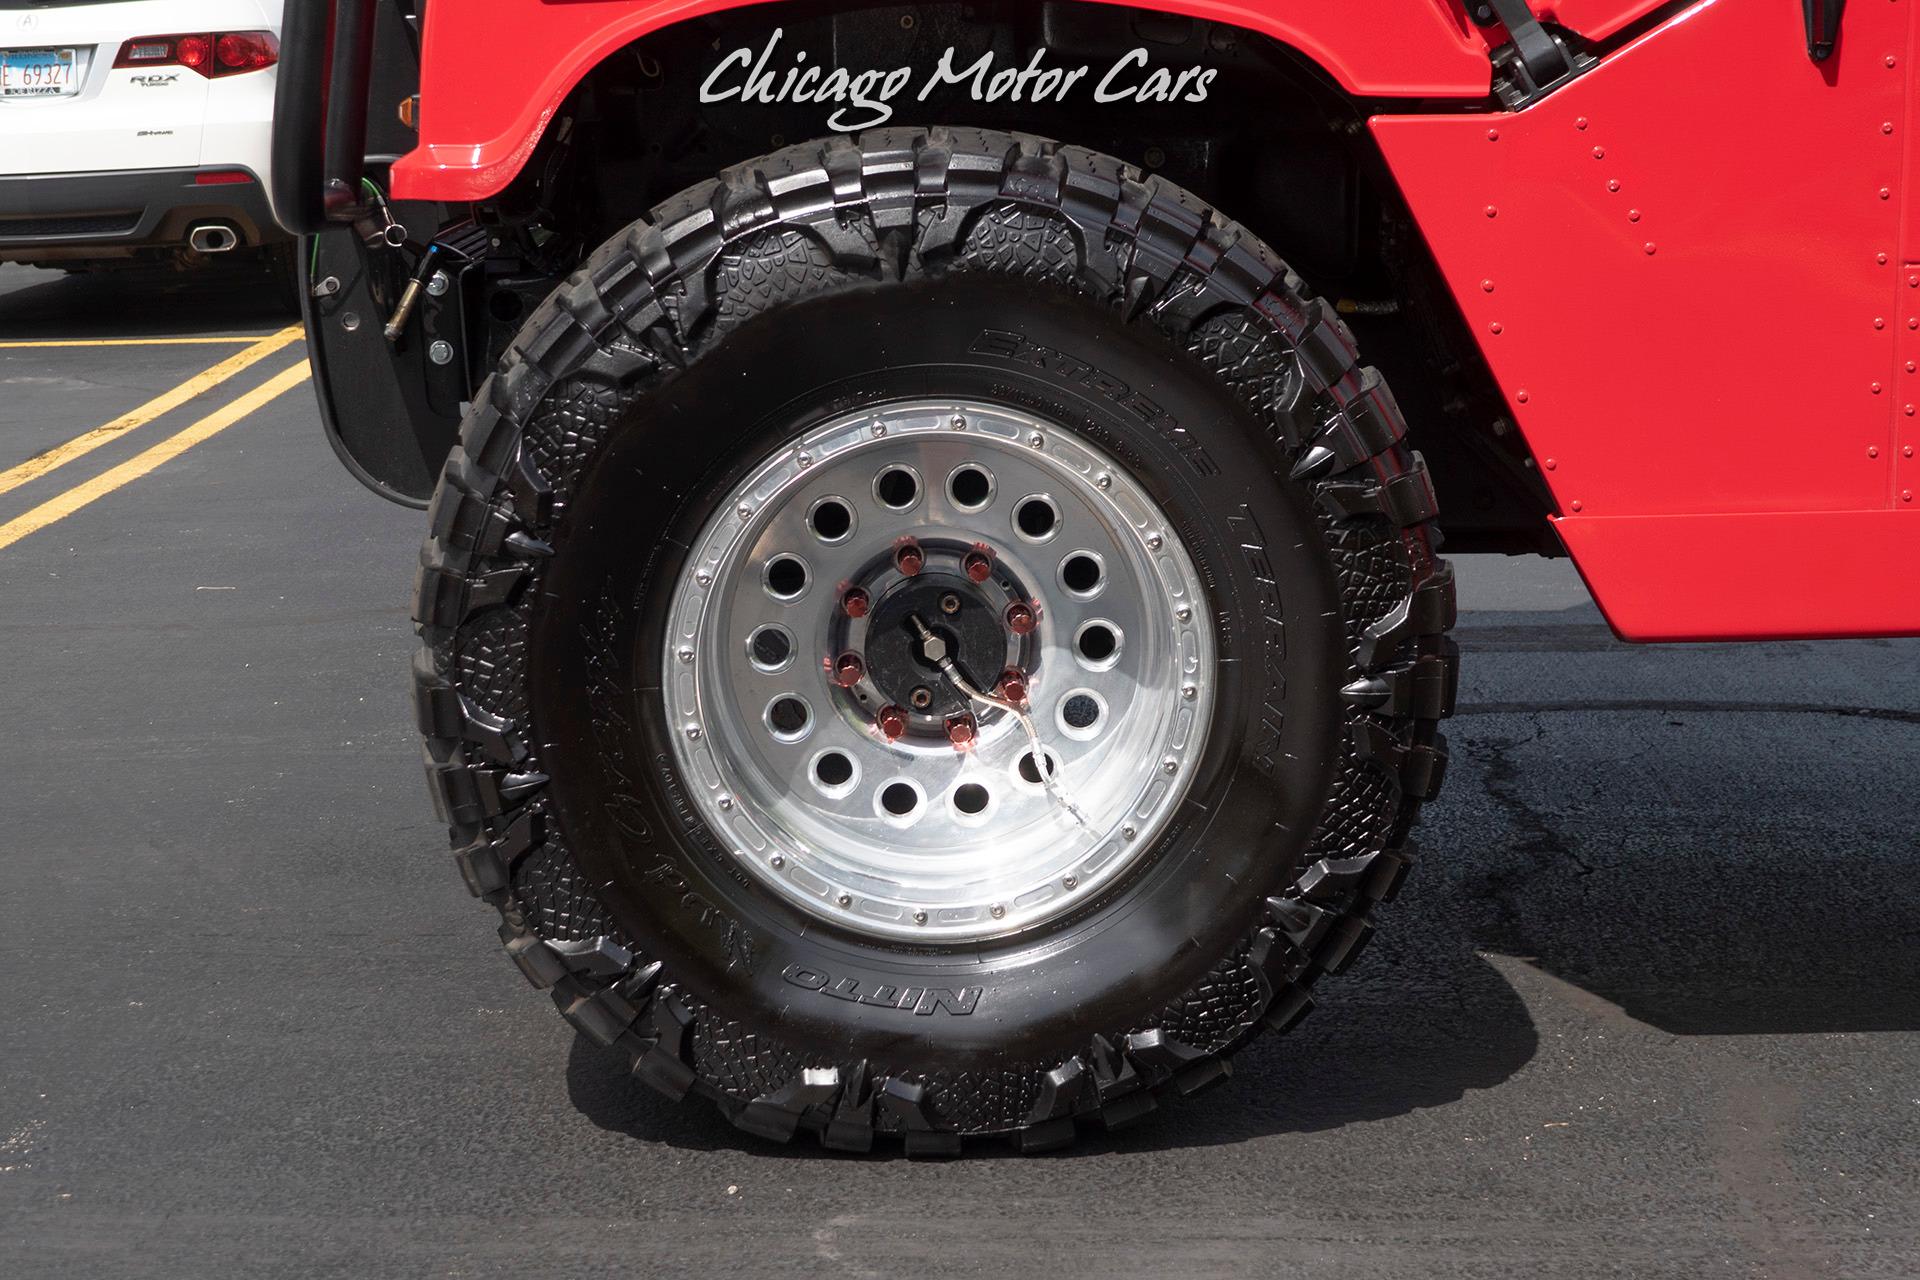 Used-2002-HUMMER-H1-Open-Top-4WD-Diesel-35K-MILES-CUSTOM-CAMO-WRAP-UPGRADED-WHEELS---TIRES